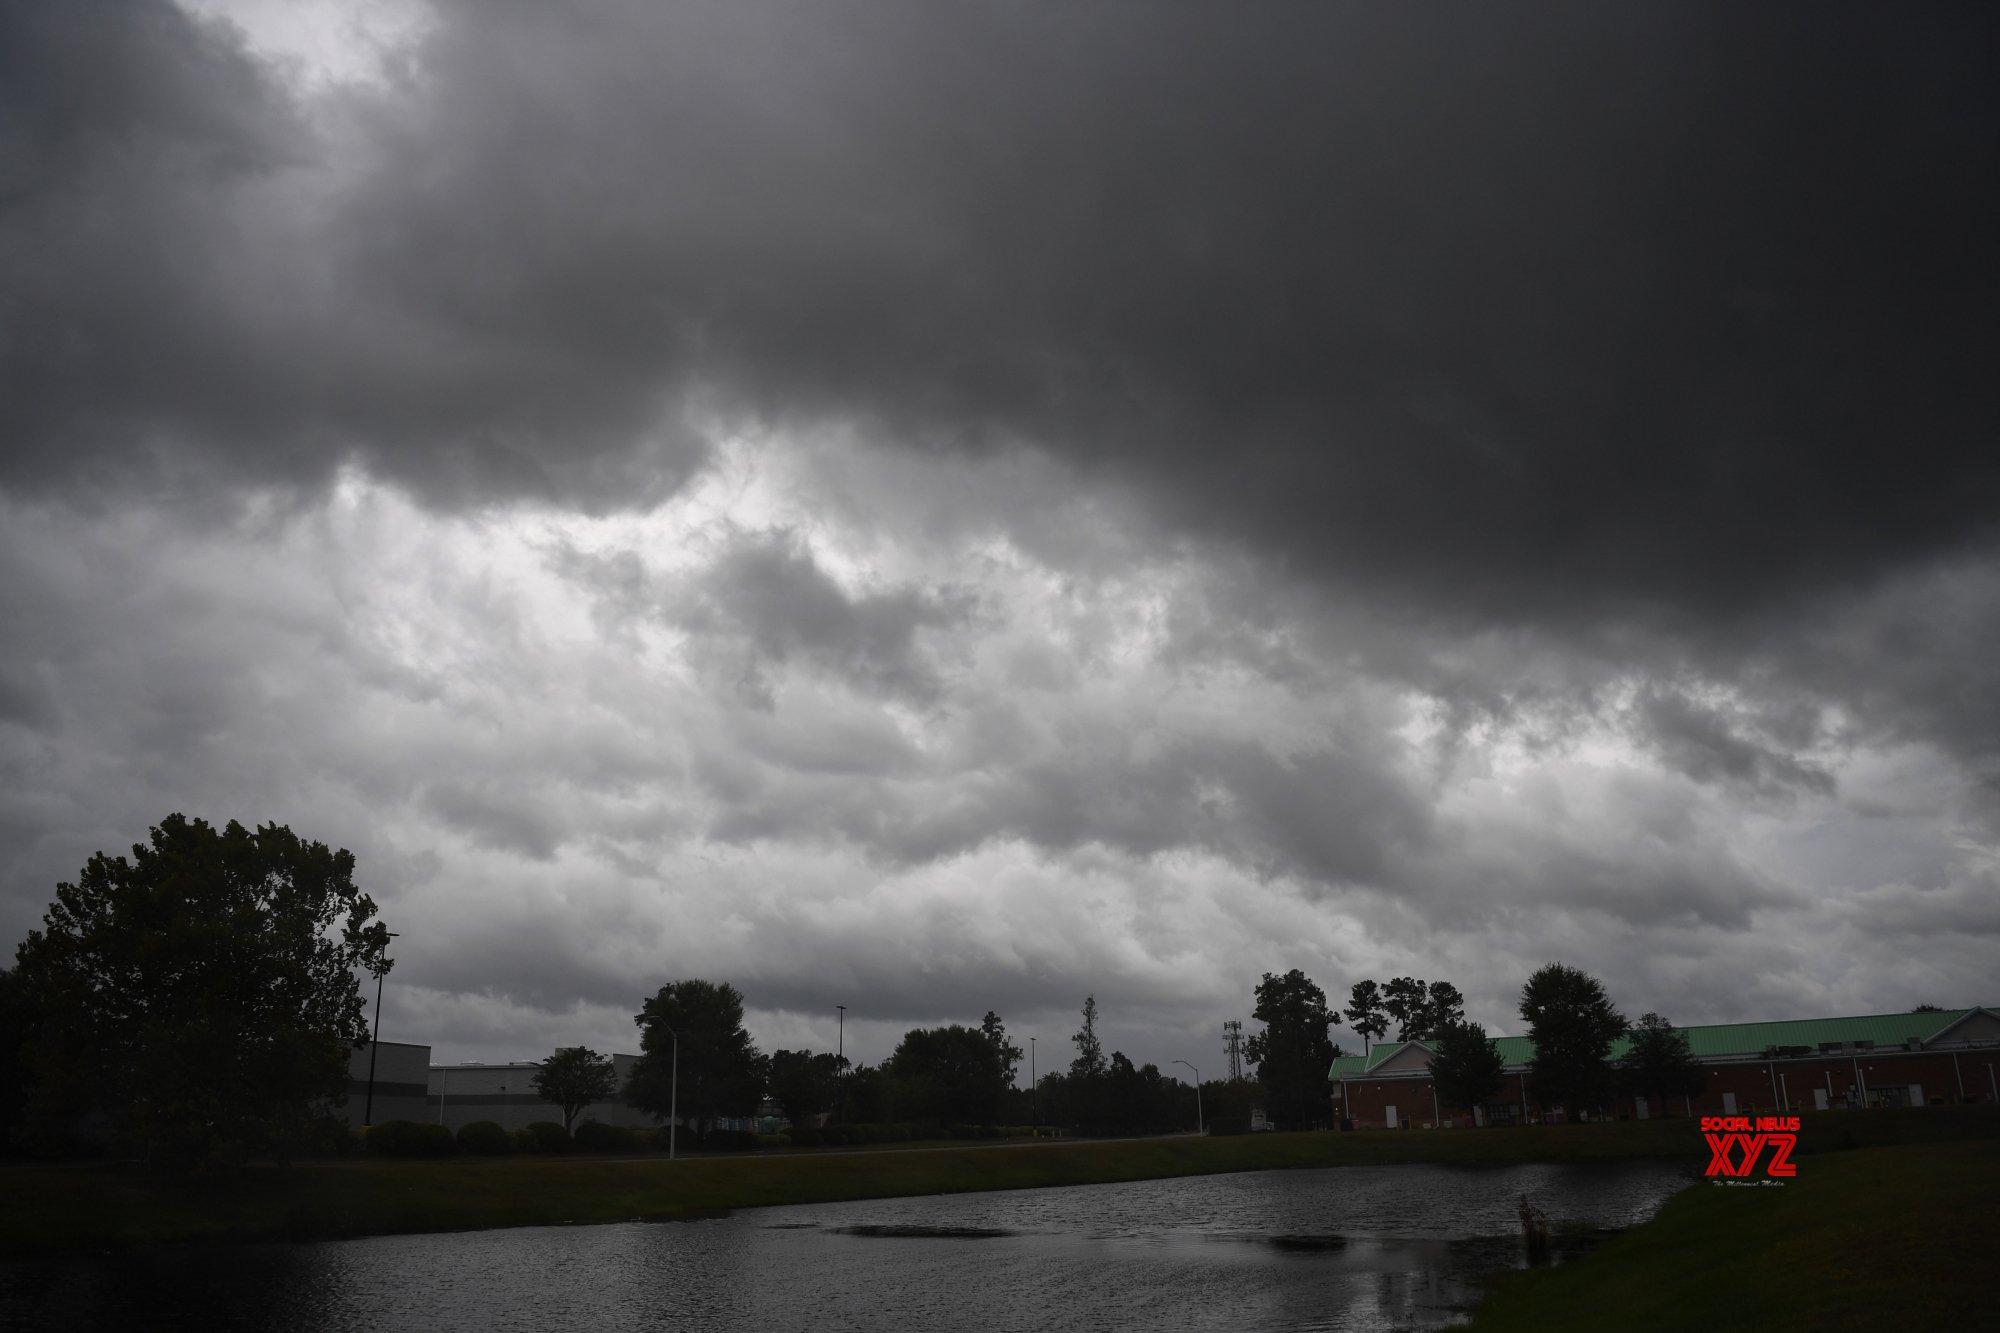 Hurricane Sally weakens storm after landfall in Alabama